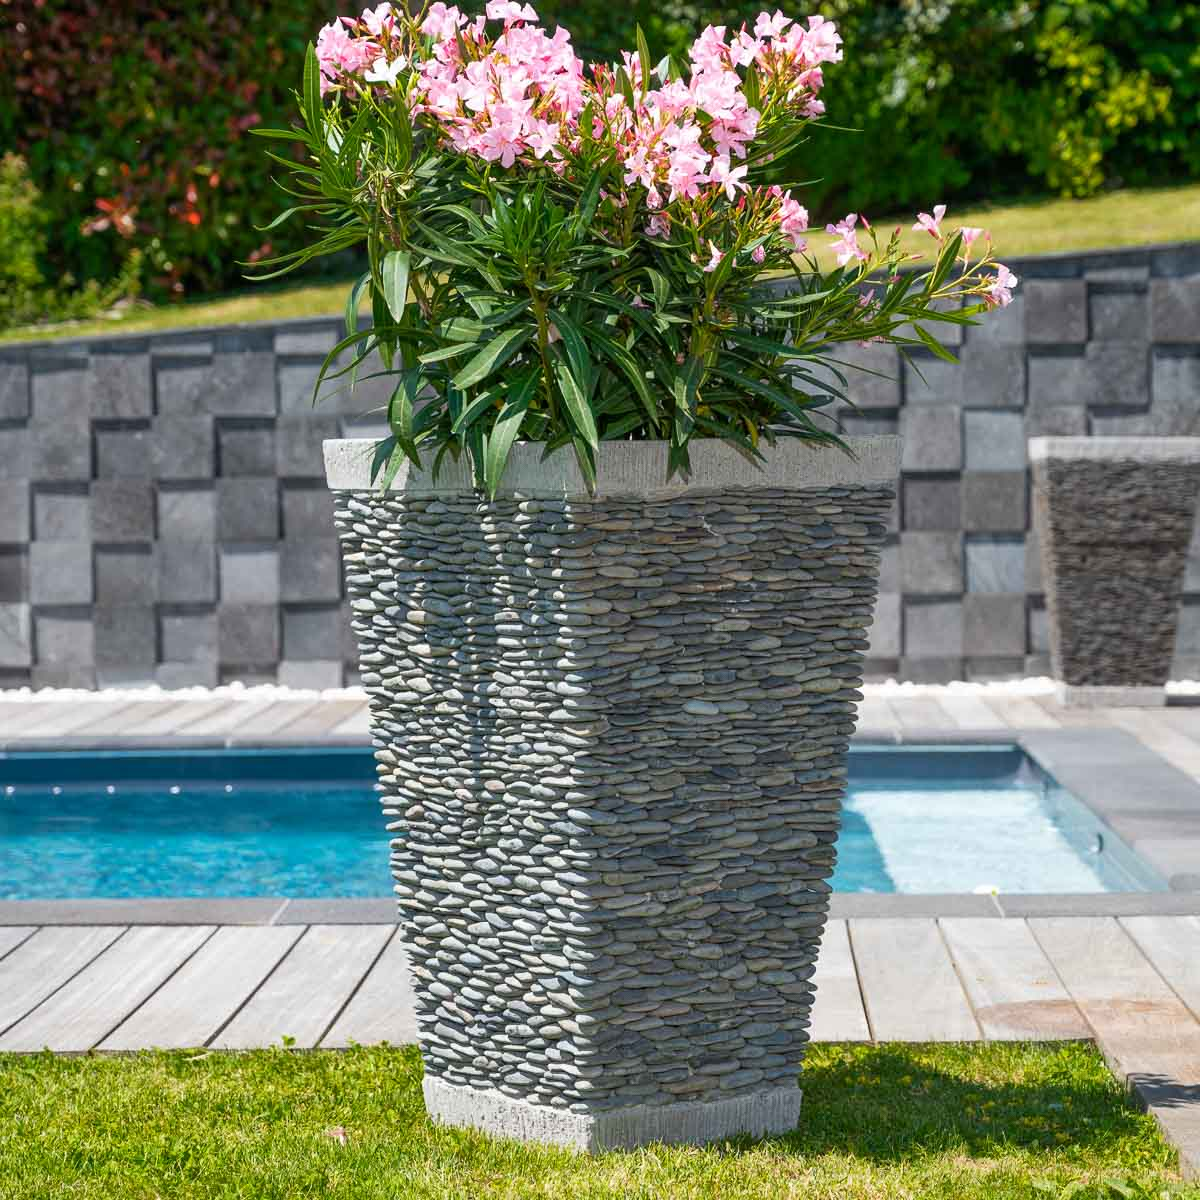 Maceta tiesto jardinera cuadrada piedra 80 cm jard n - Macetas de piedra para jardin ...